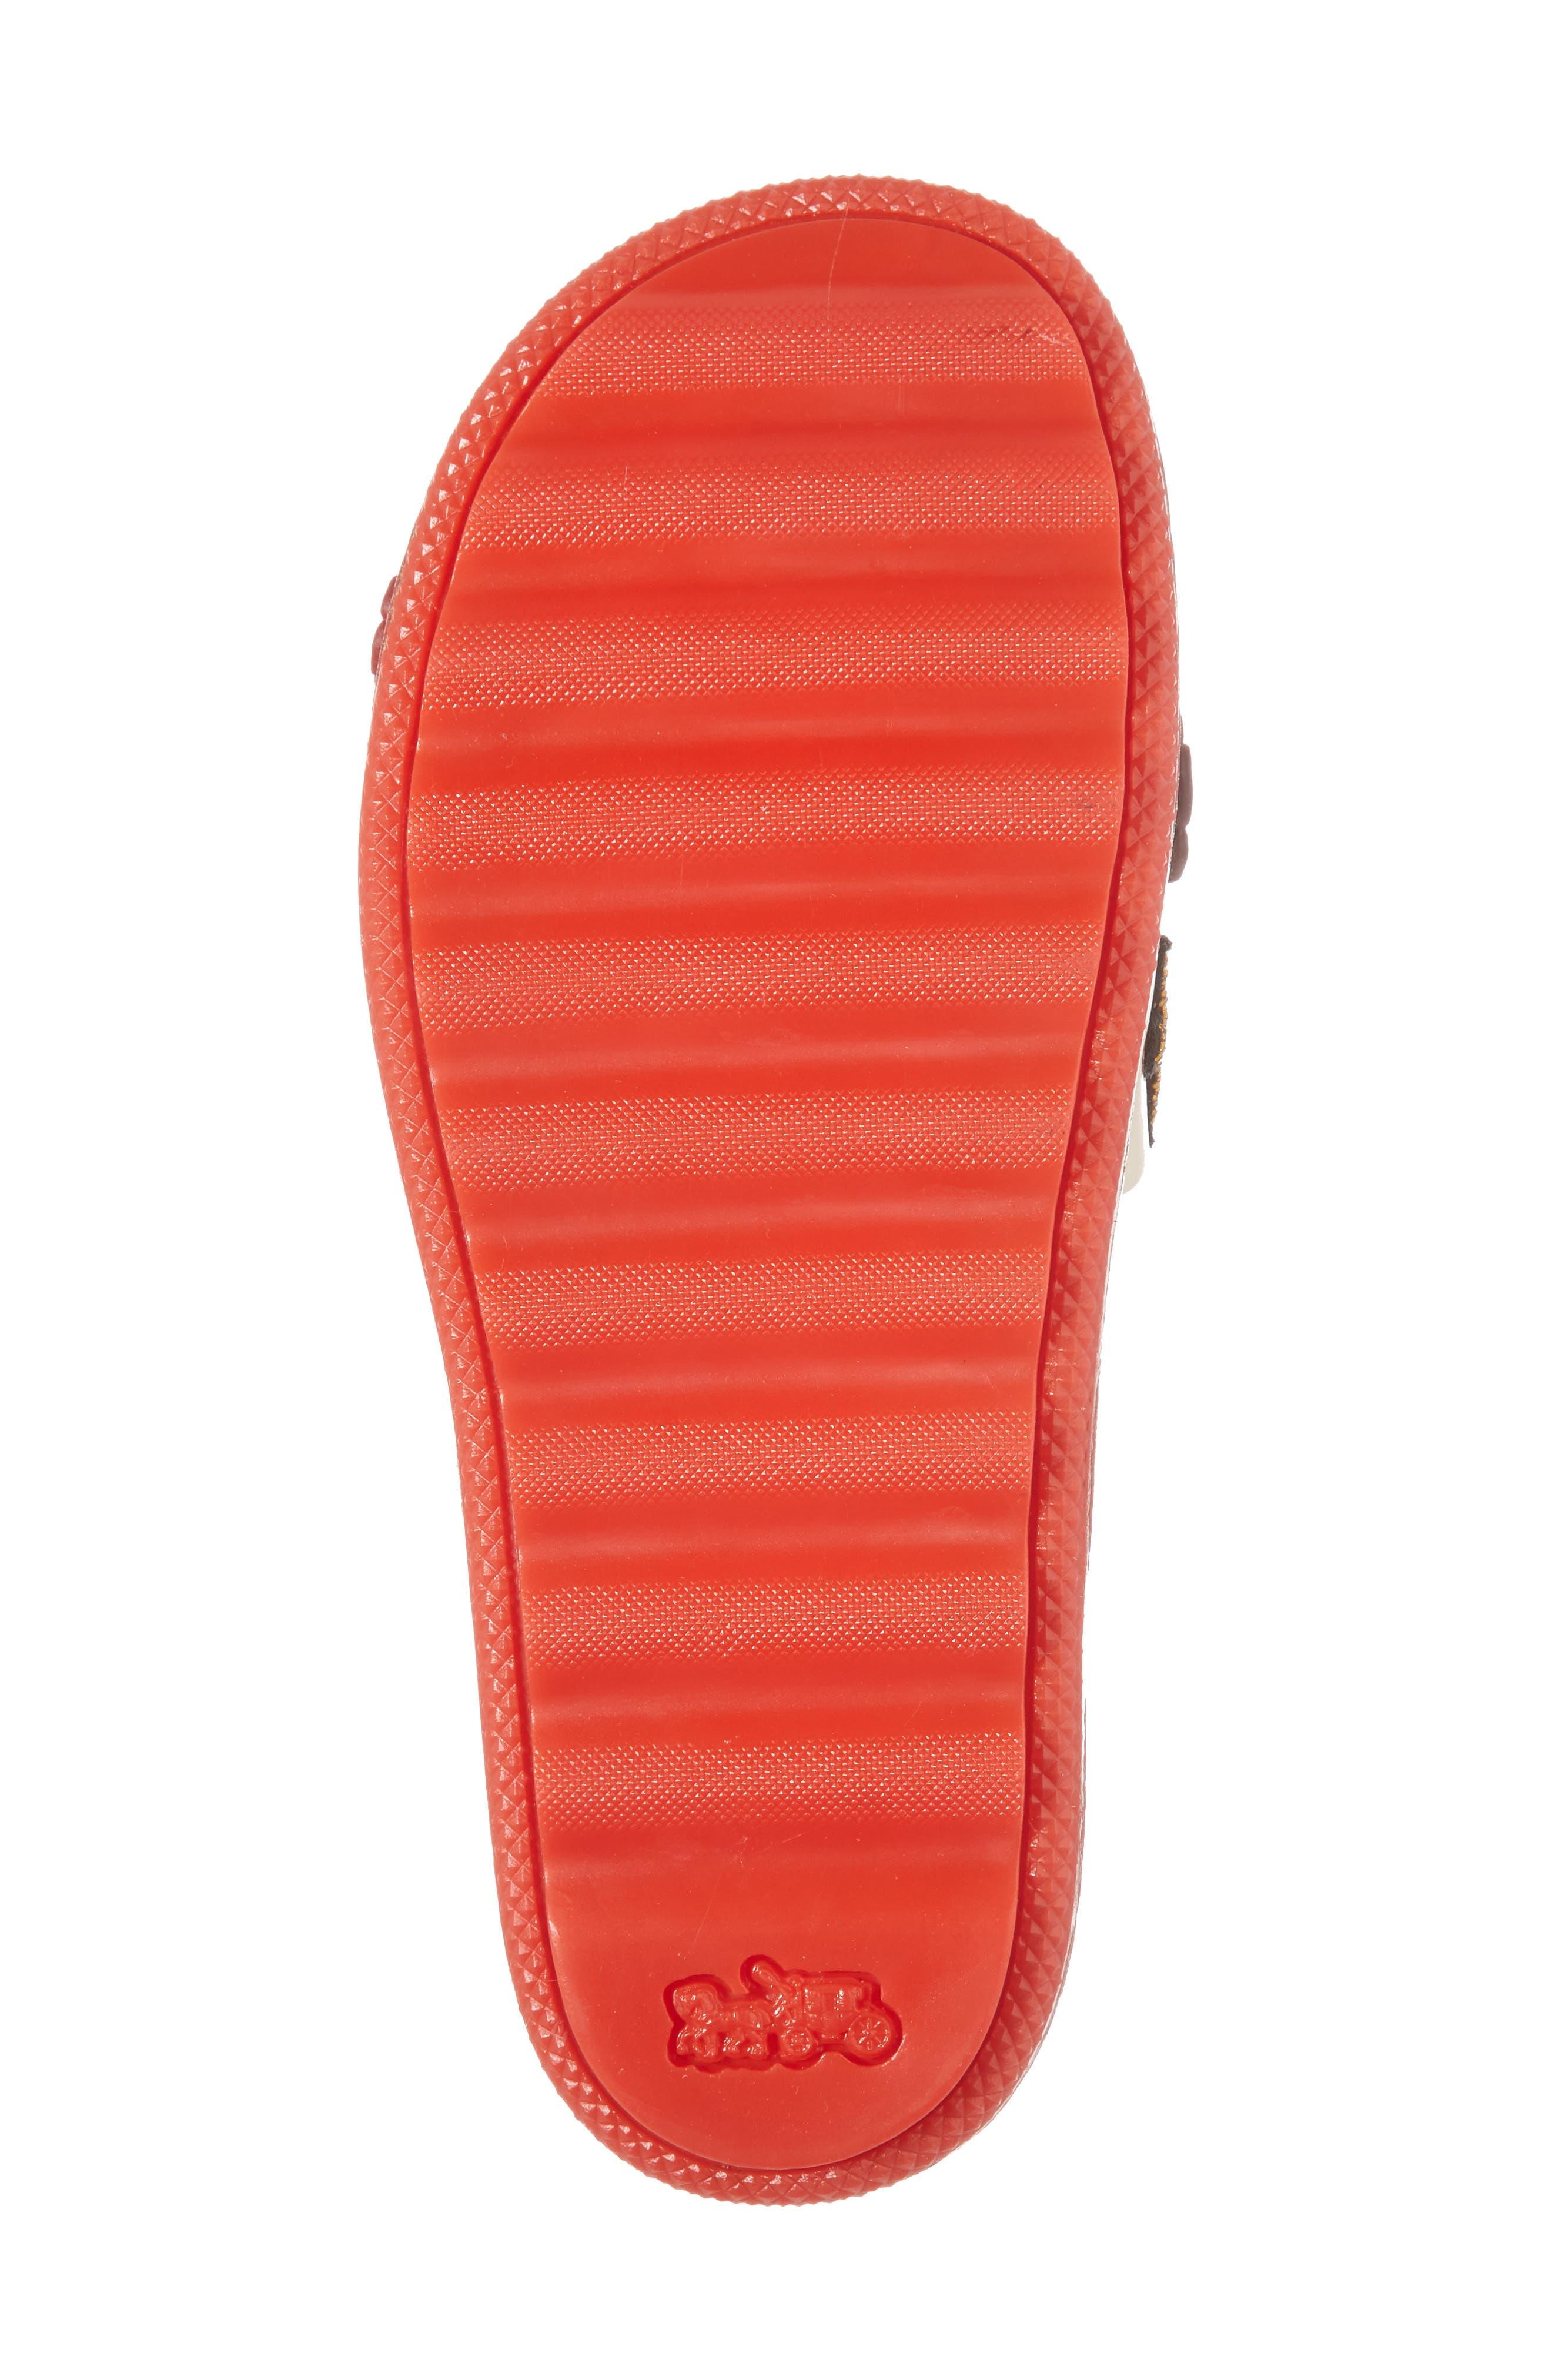 Patch Sport Slide Sandal,                             Alternate thumbnail 6, color,                             Ivory/ Red Leather